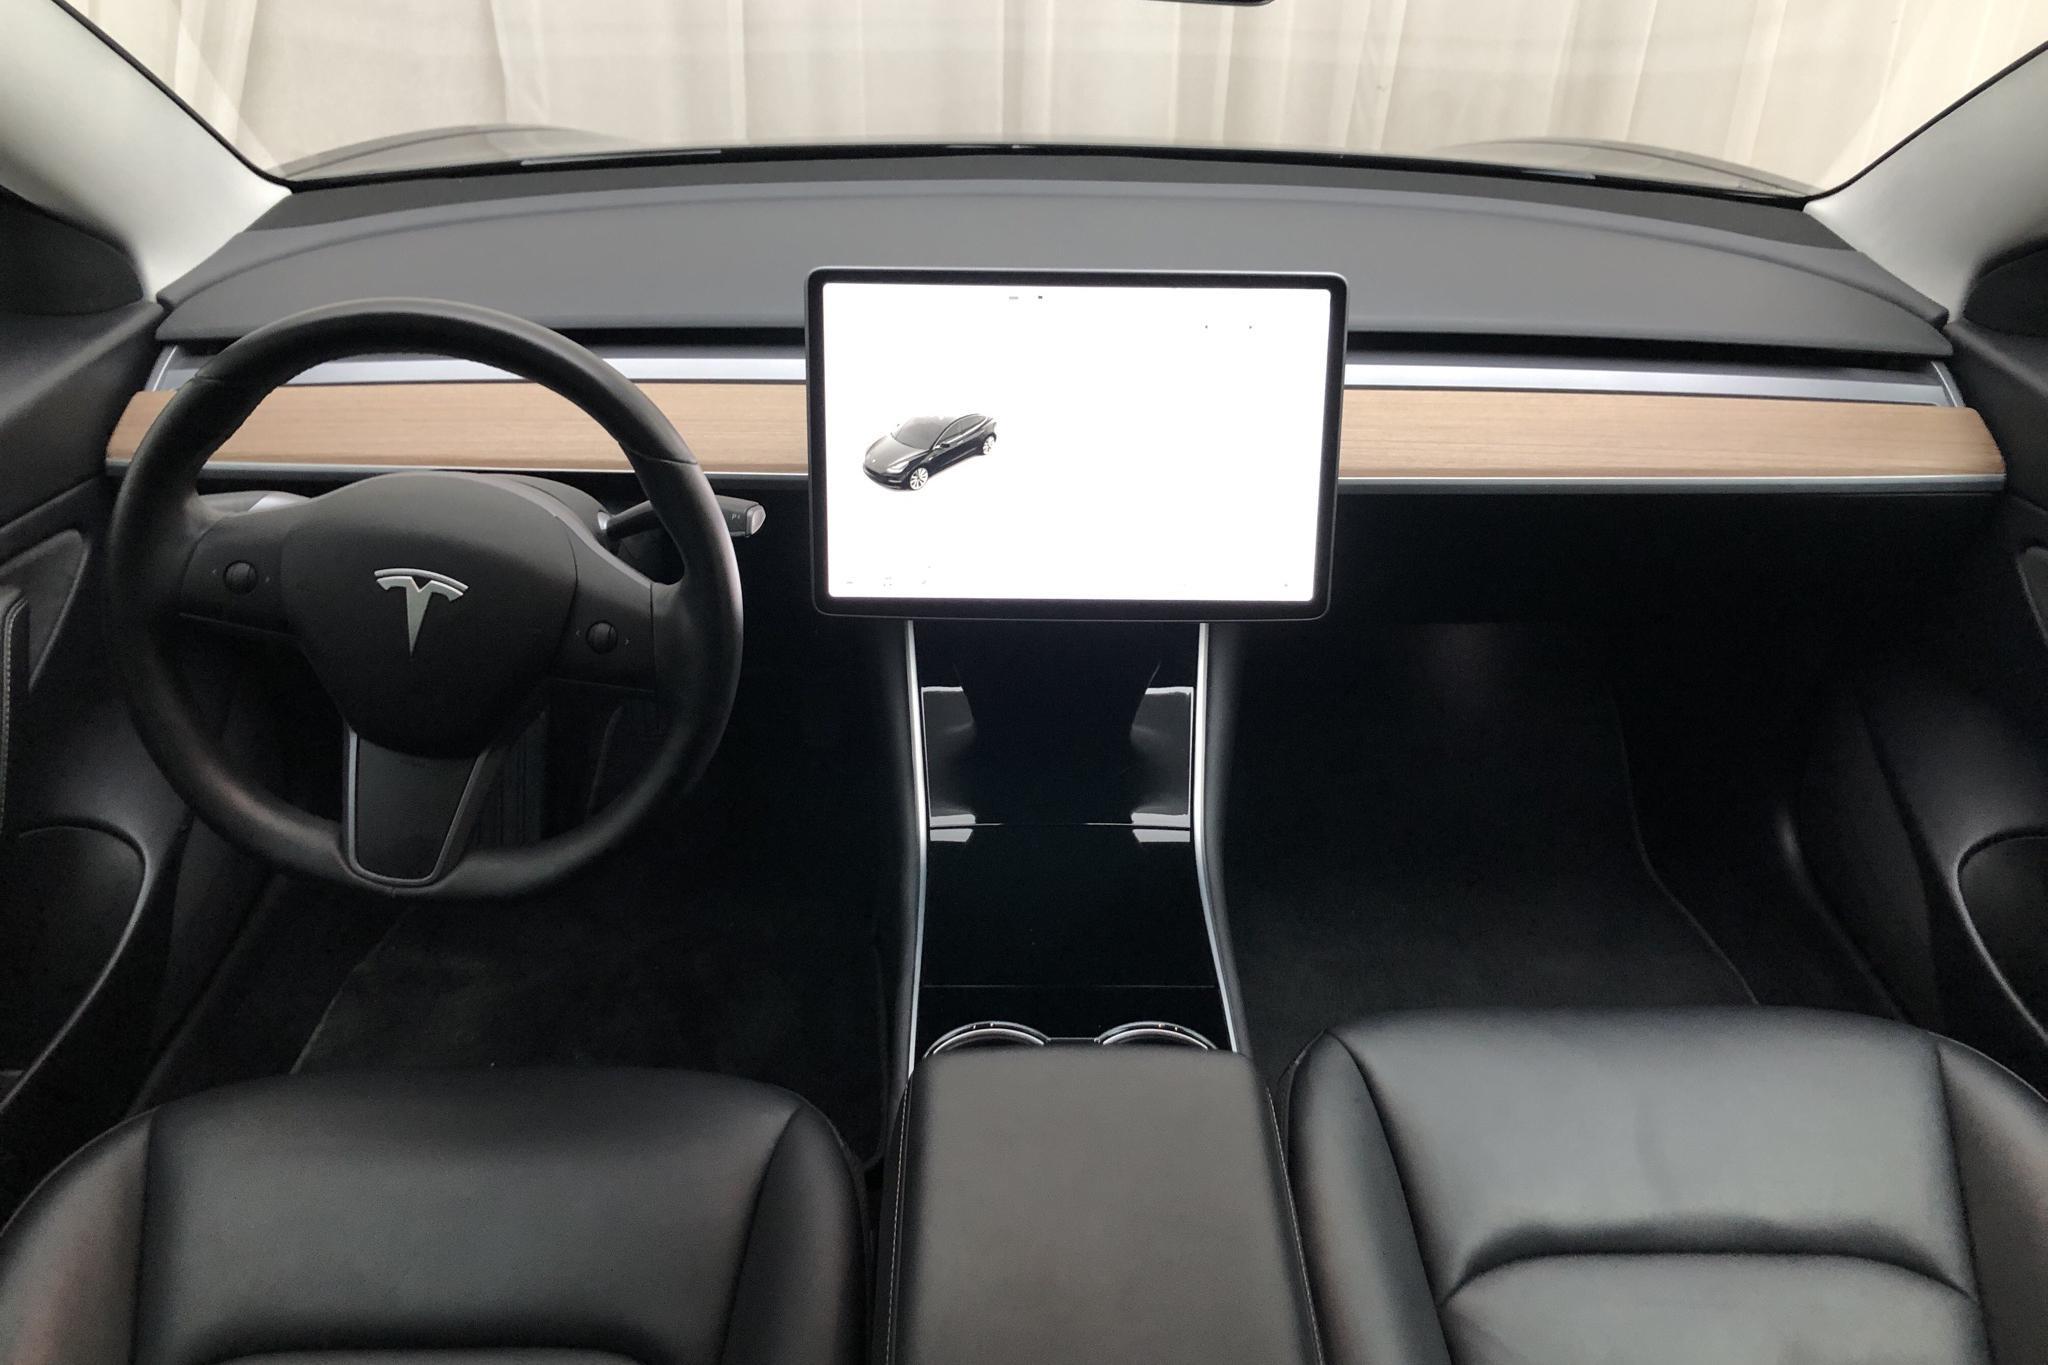 Tesla Model 3 Long Range AWD - 5 111 mil - Automat - svart - 2019